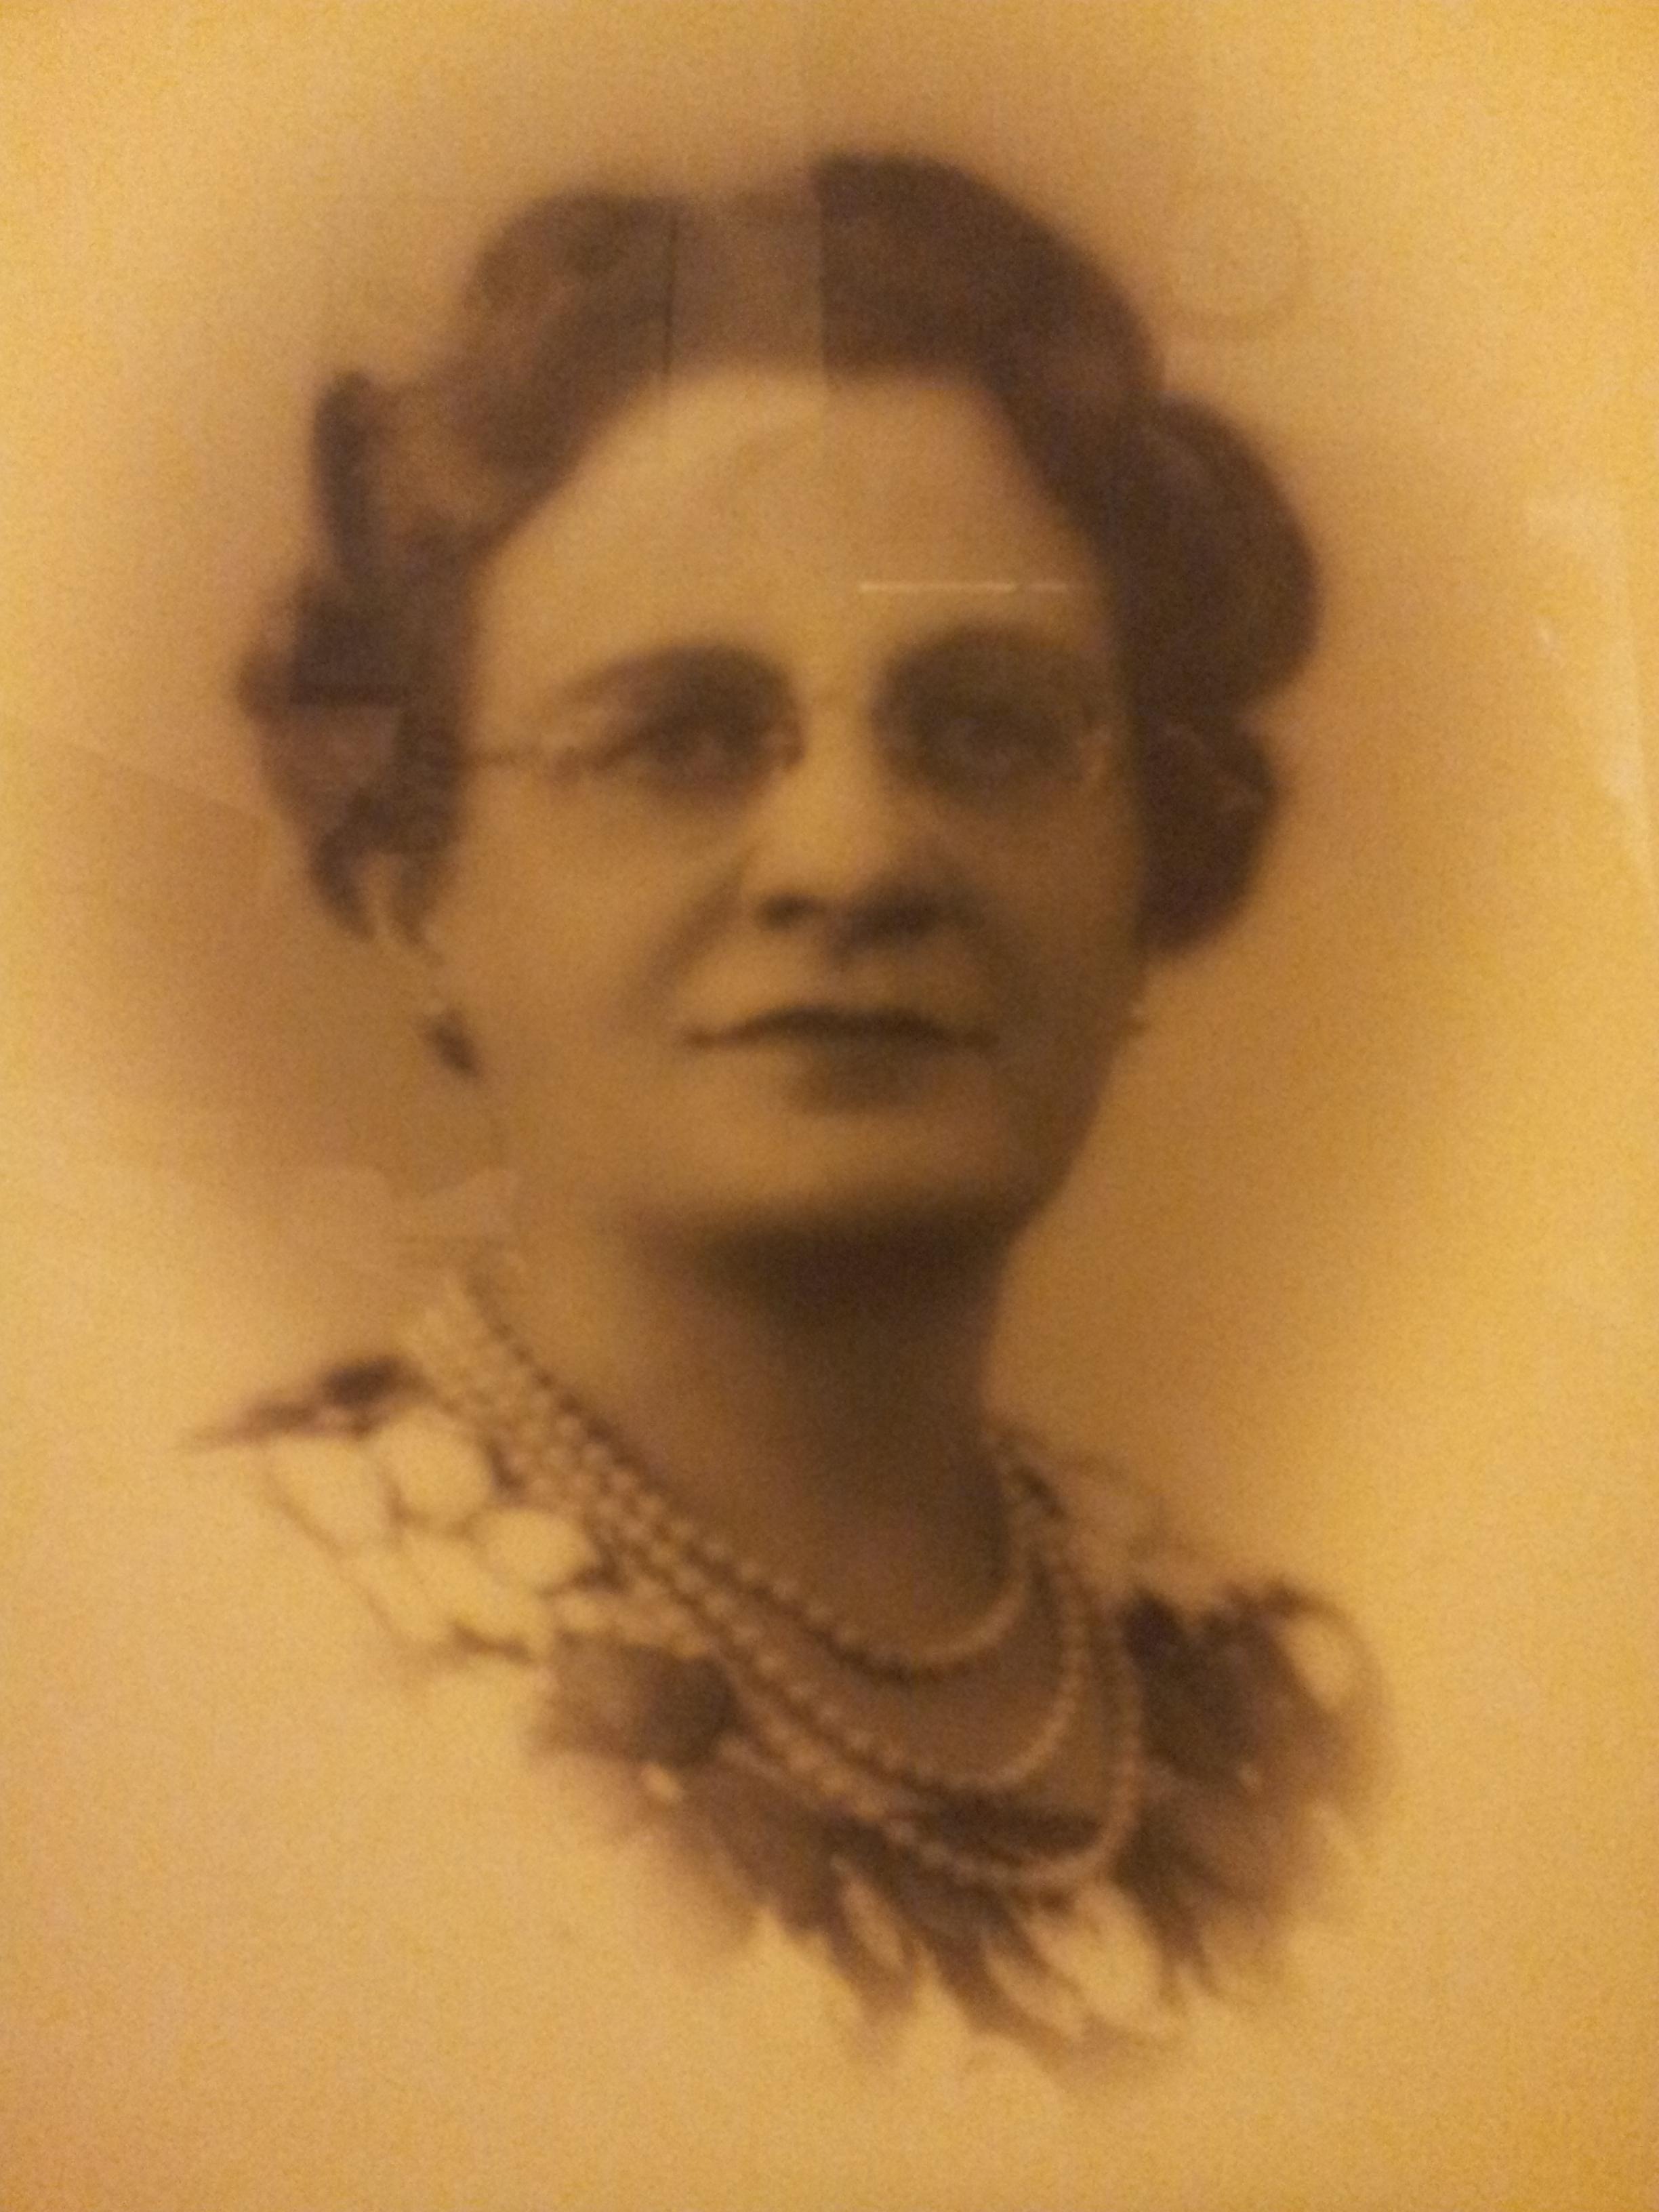 Dr. Isabelle MacDonald, founder of Albertson Memorial Church